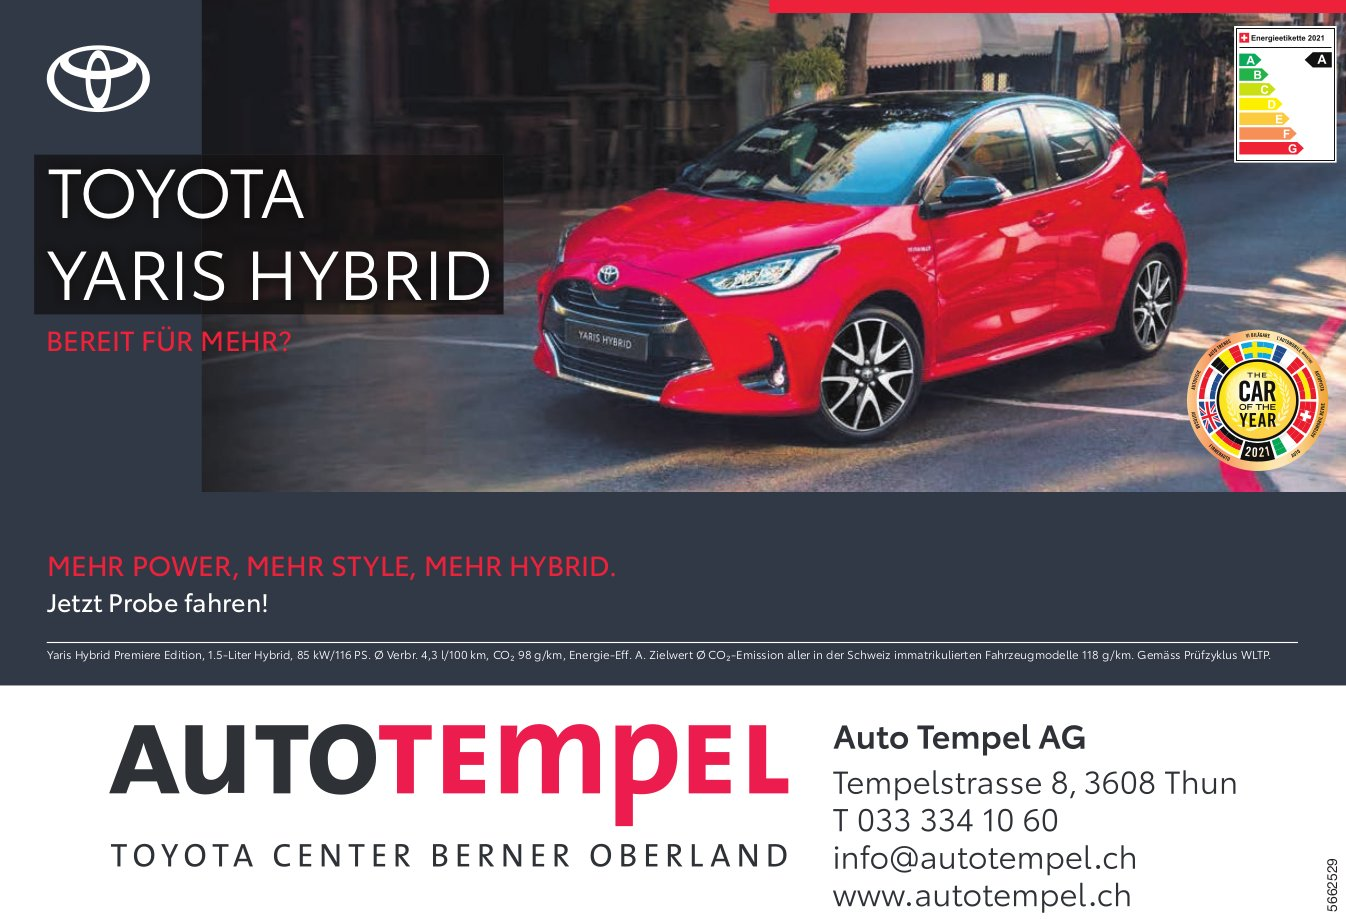 Auto Tempel AG - Toyota Yaris Hybrid